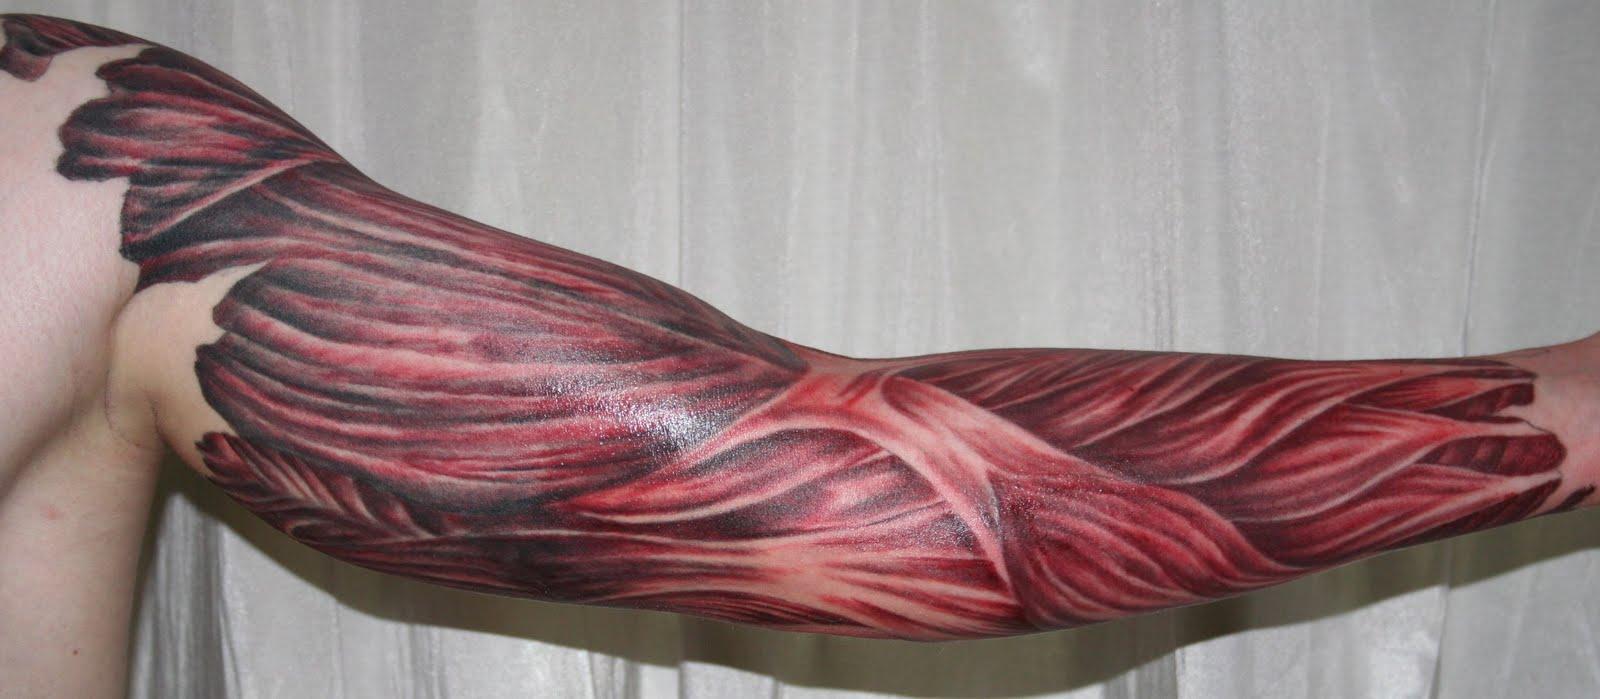 значение татуировки роза на руке - Значение татуировки роза Символика тату